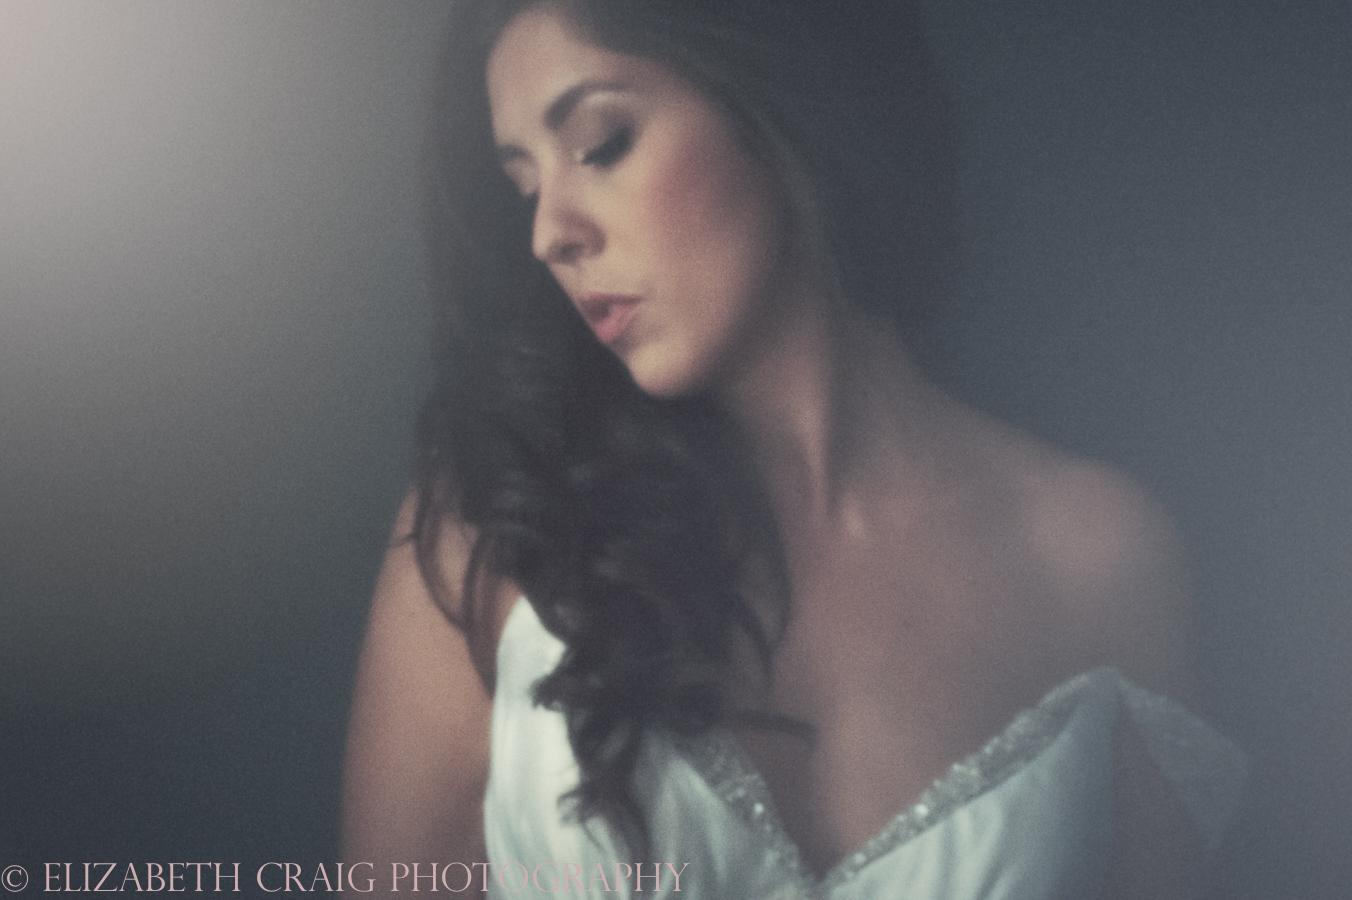 elizabeth-craig-photography-pinhole-lens-001-2